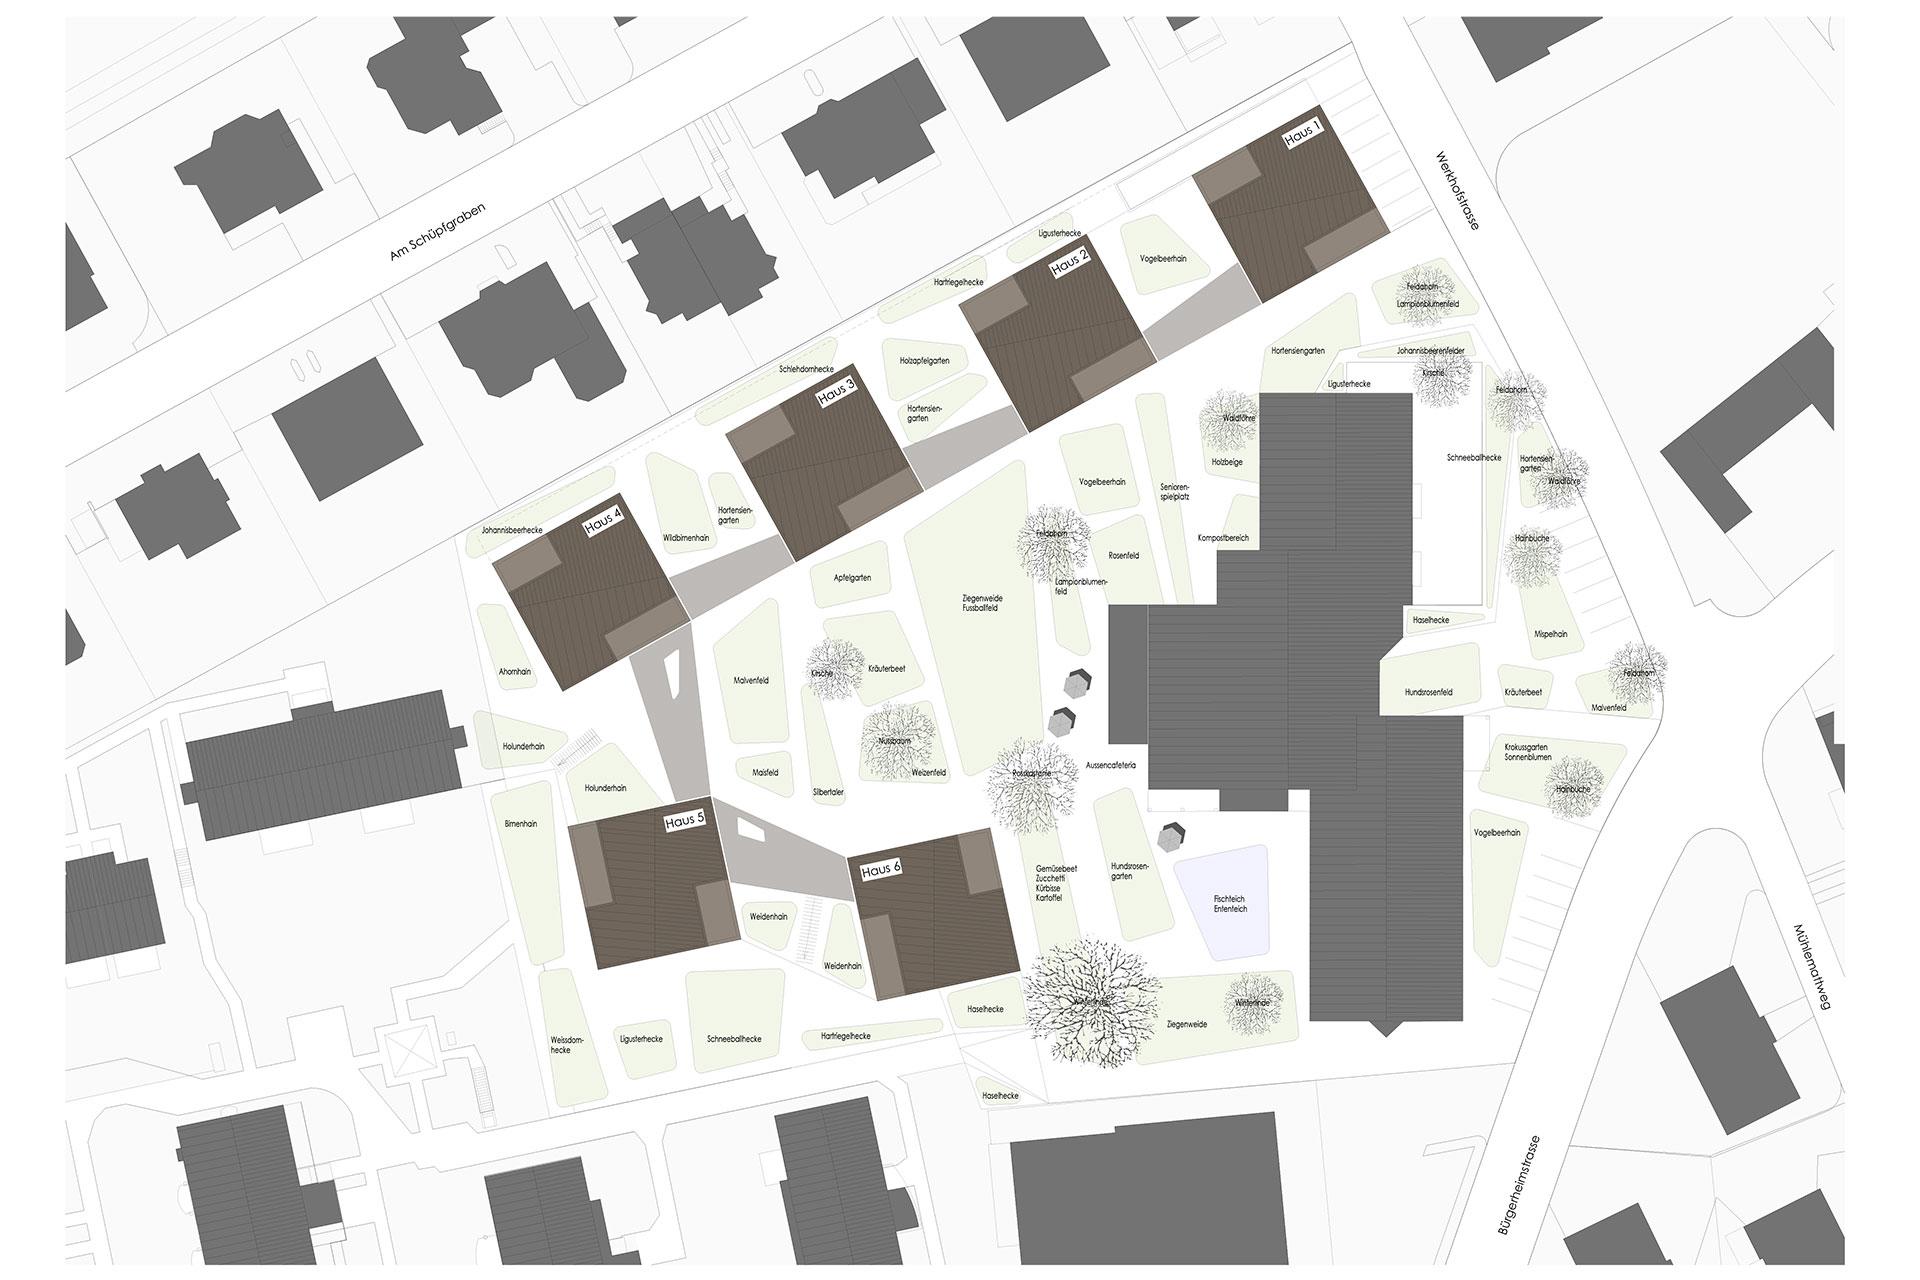 0905-STAD-Abgabe-Plan-1_Situation